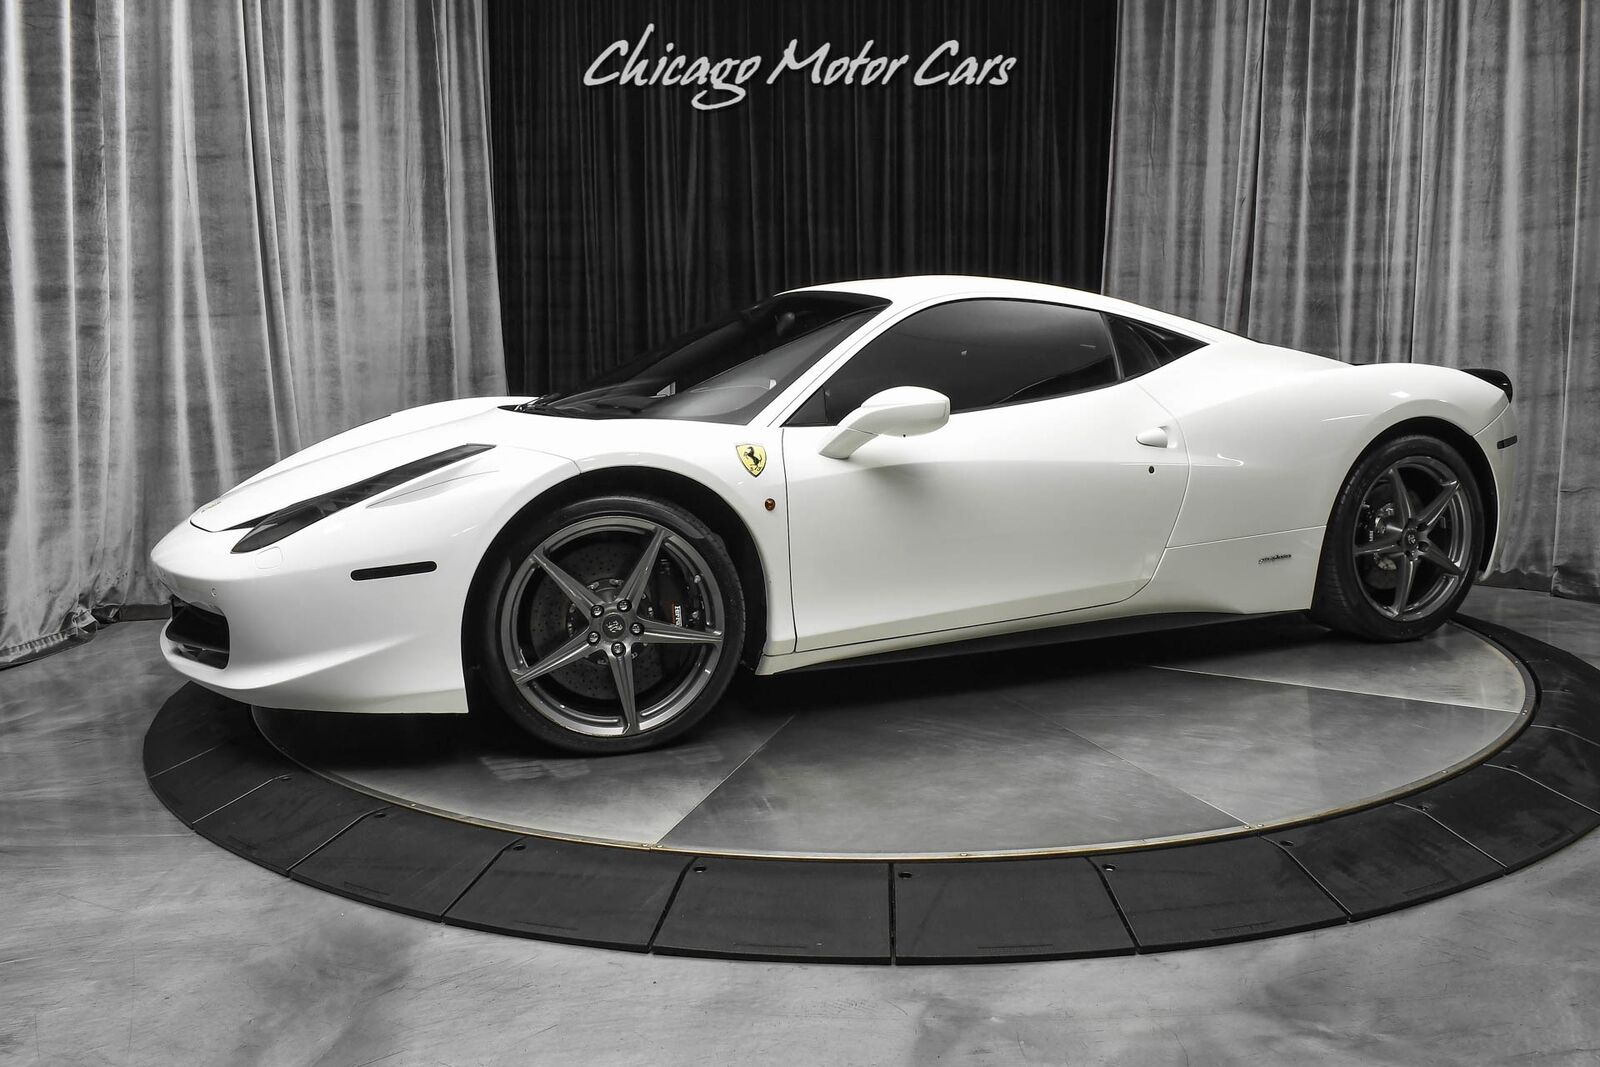 2012 Ferrari 458 Italia Coupe Only 17k Miles Carbon Fiber LED Steering Whe Bianc